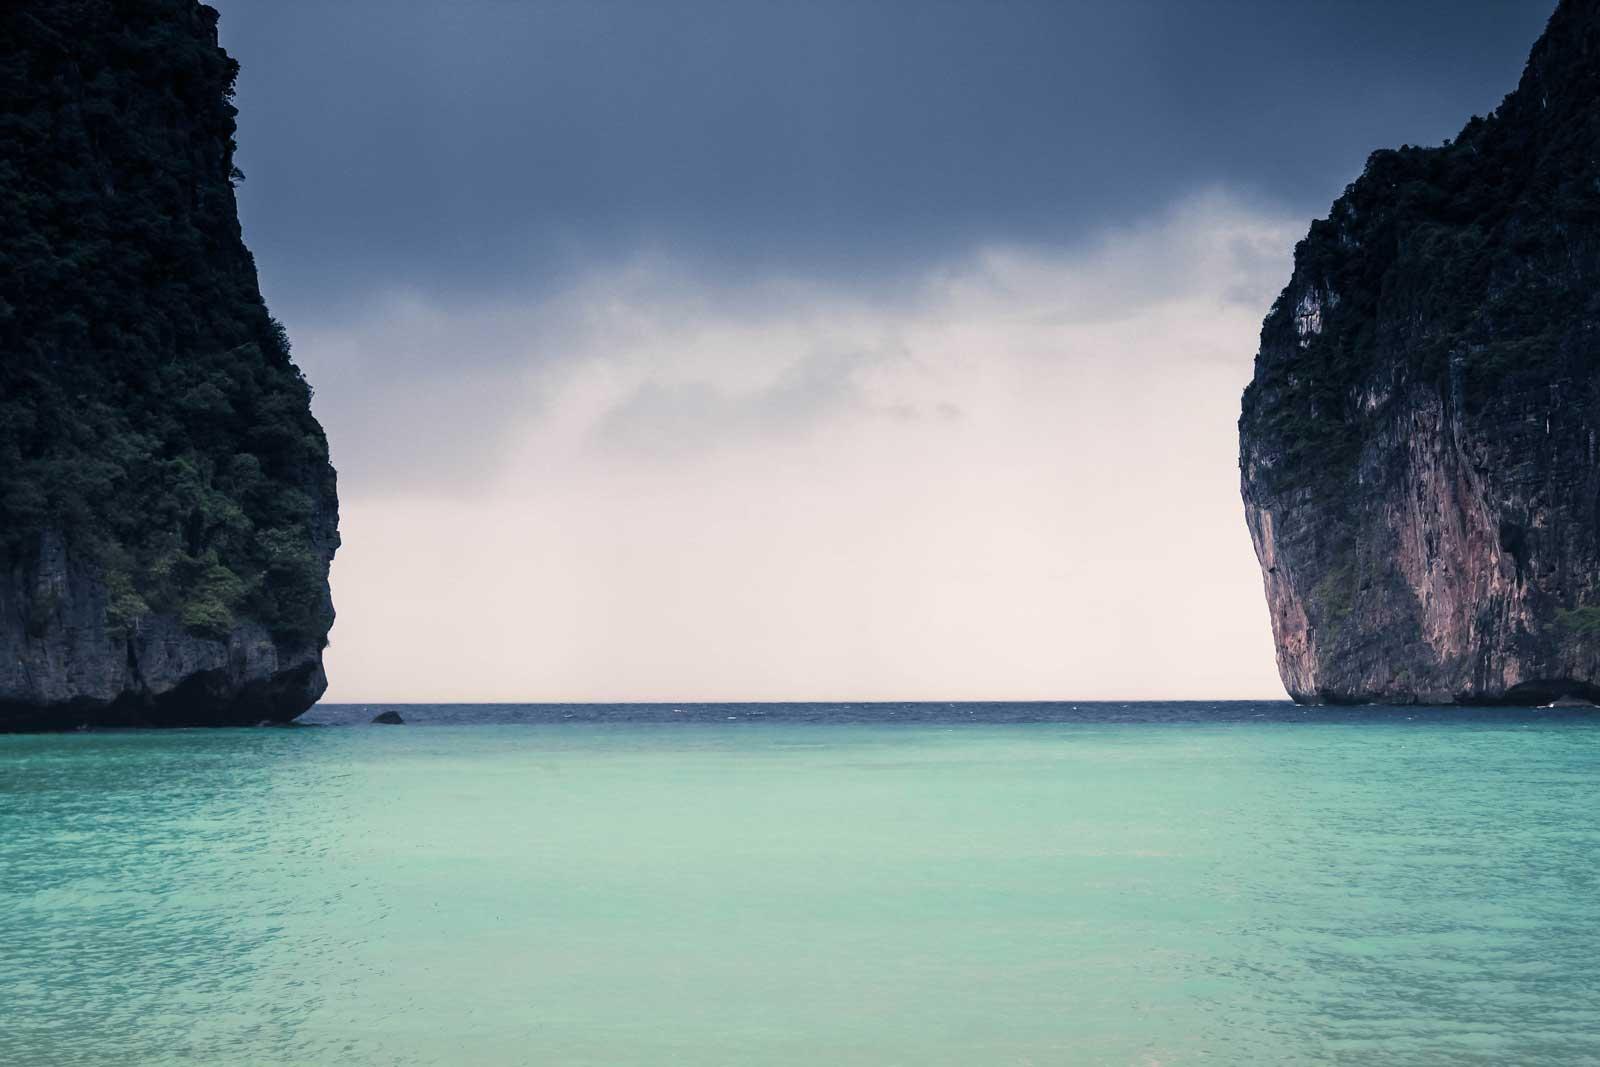 ocean-between-clifs